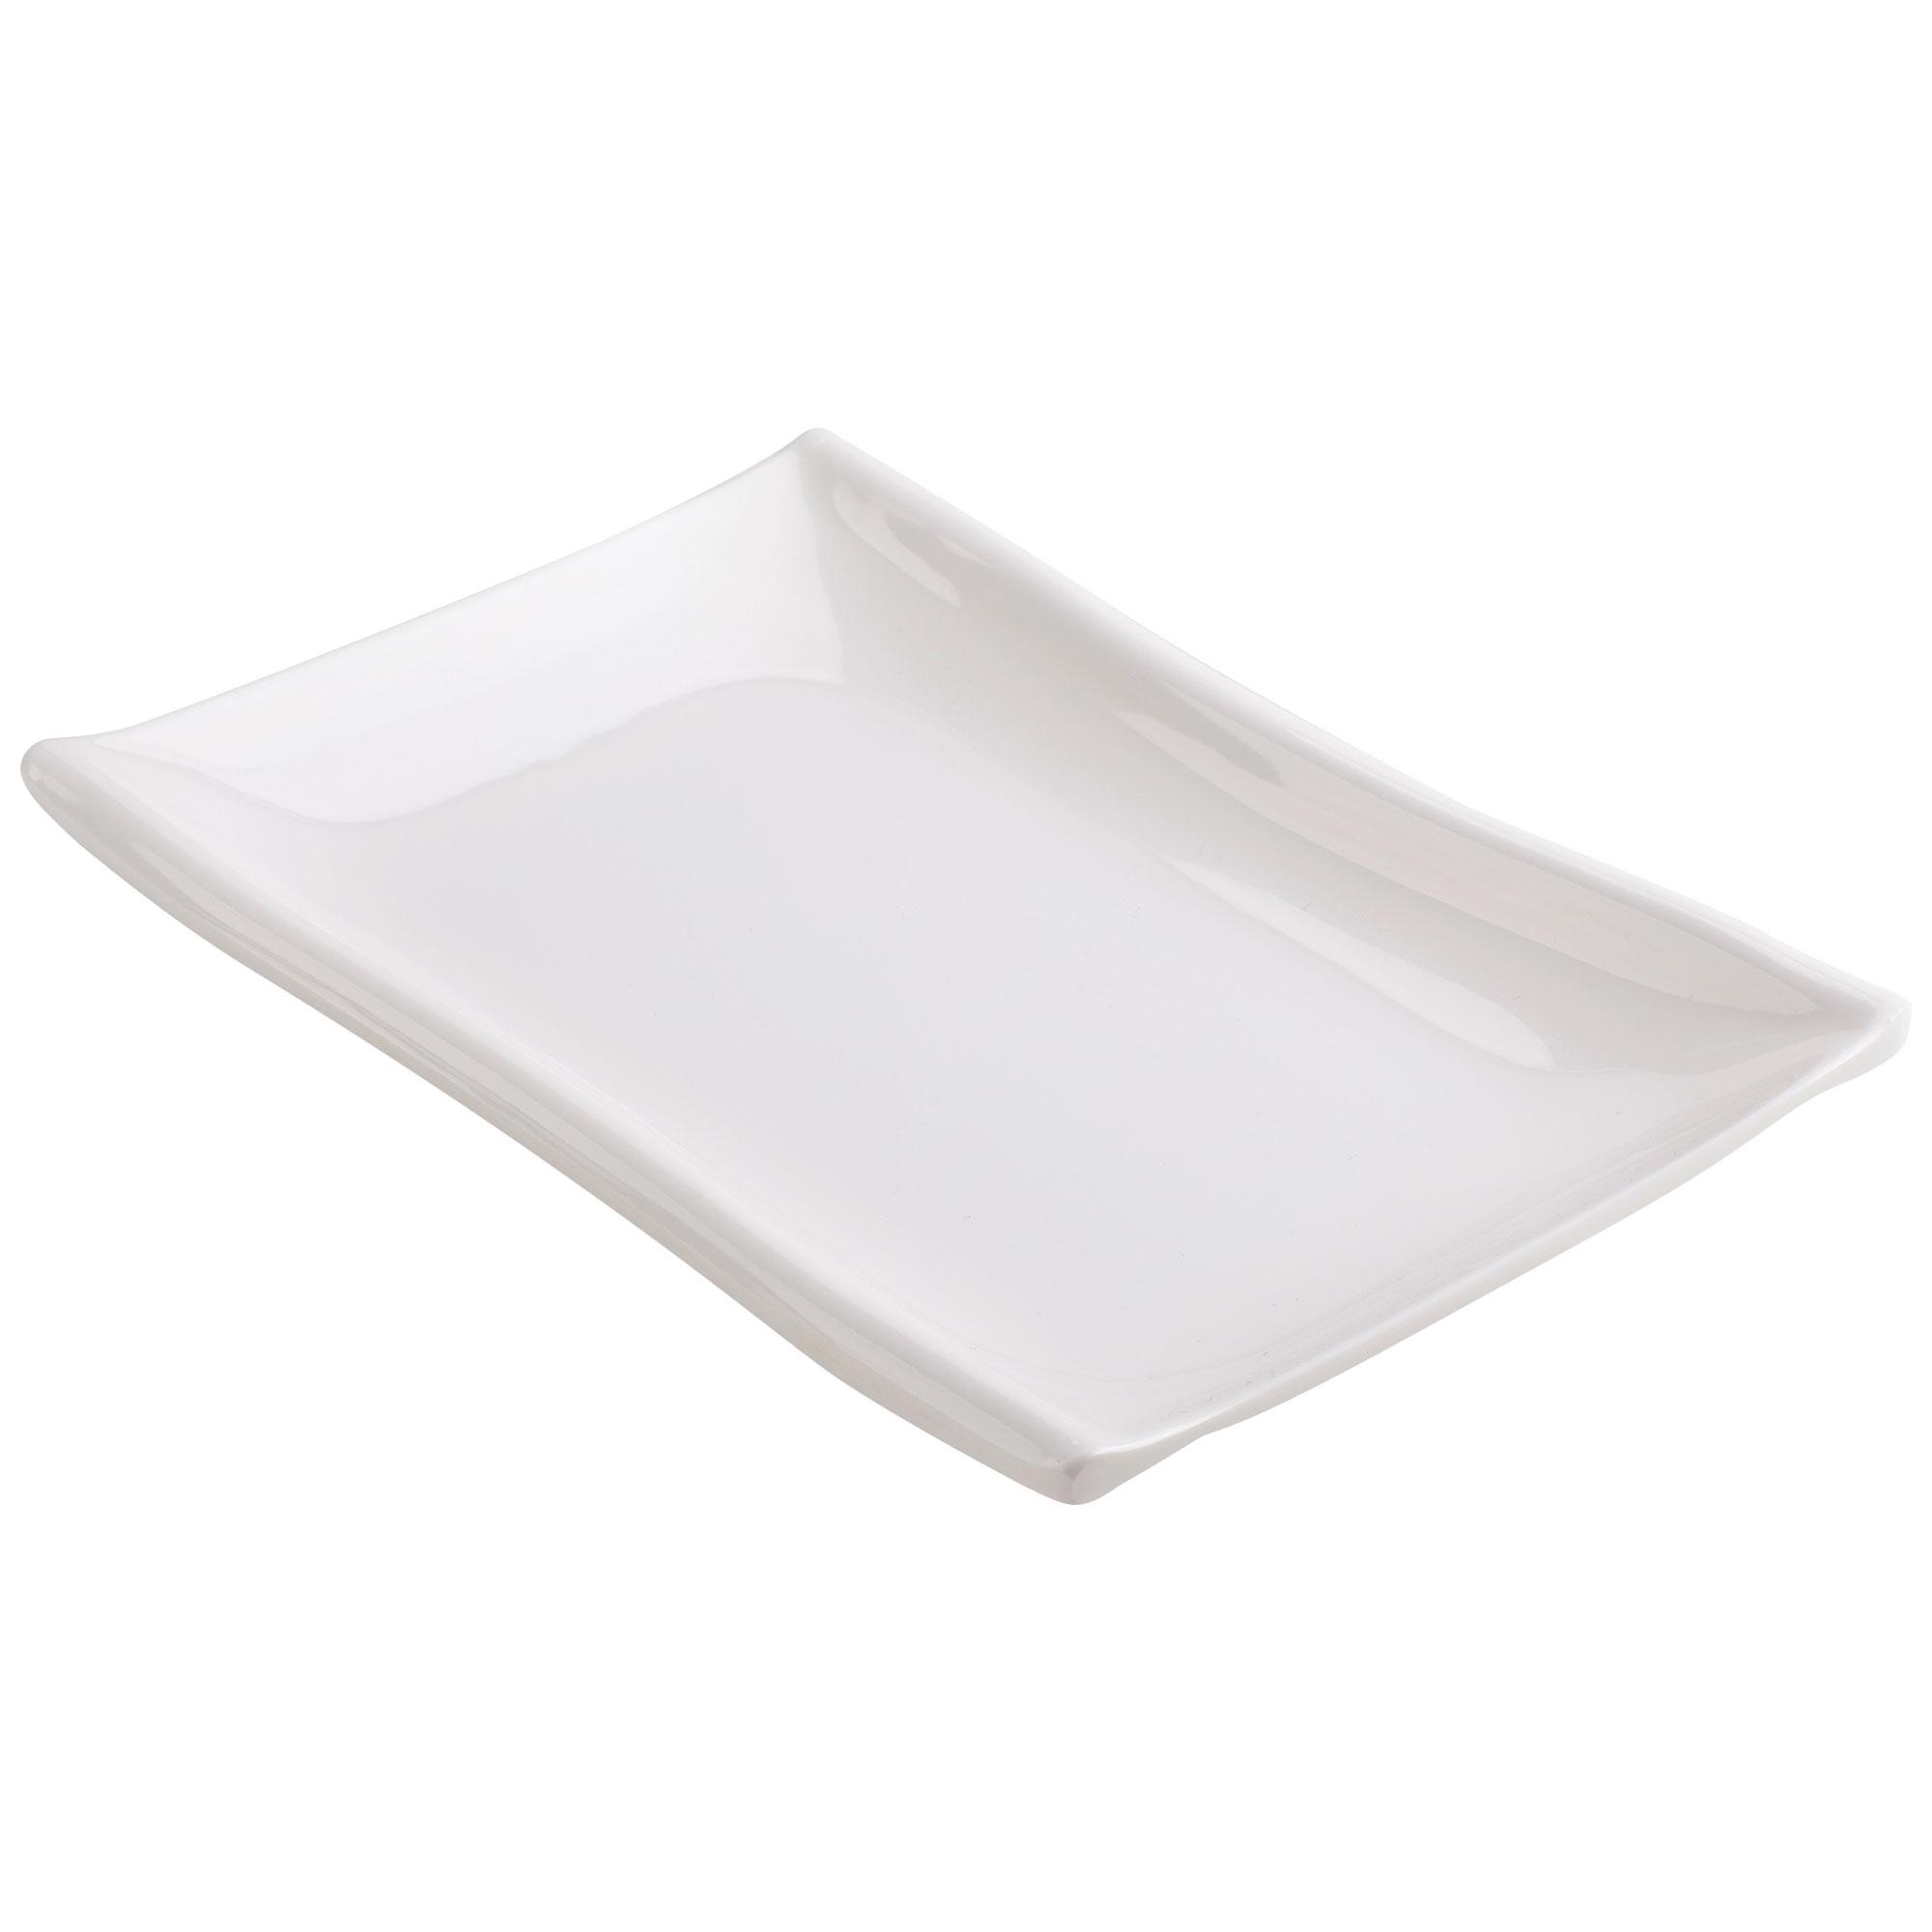 Household Rectangle Design Dessert Food Appetizer Serving Plate Dish White